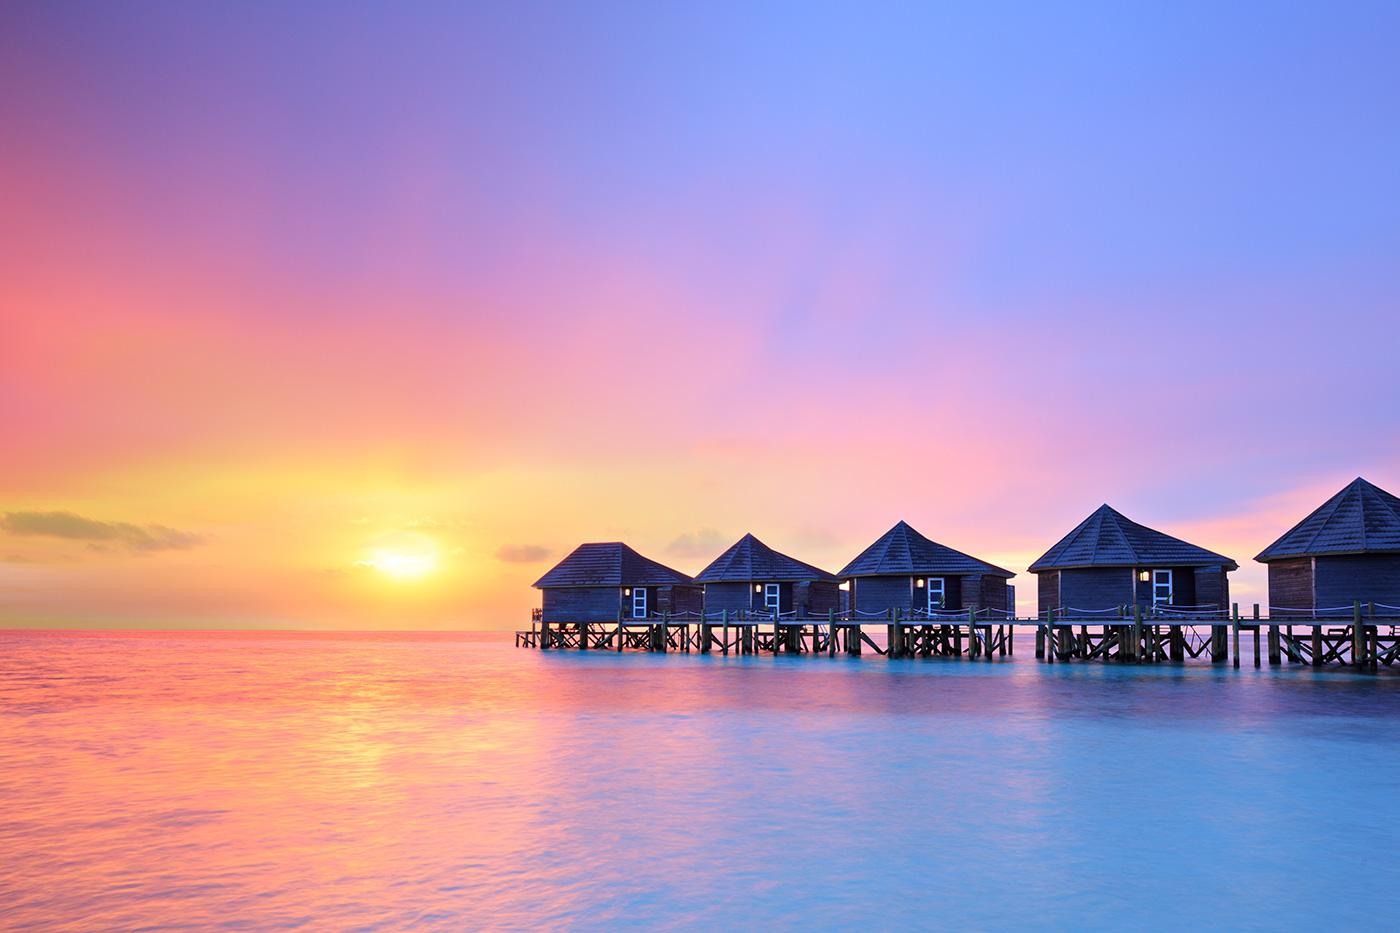 LED Bild Malediven